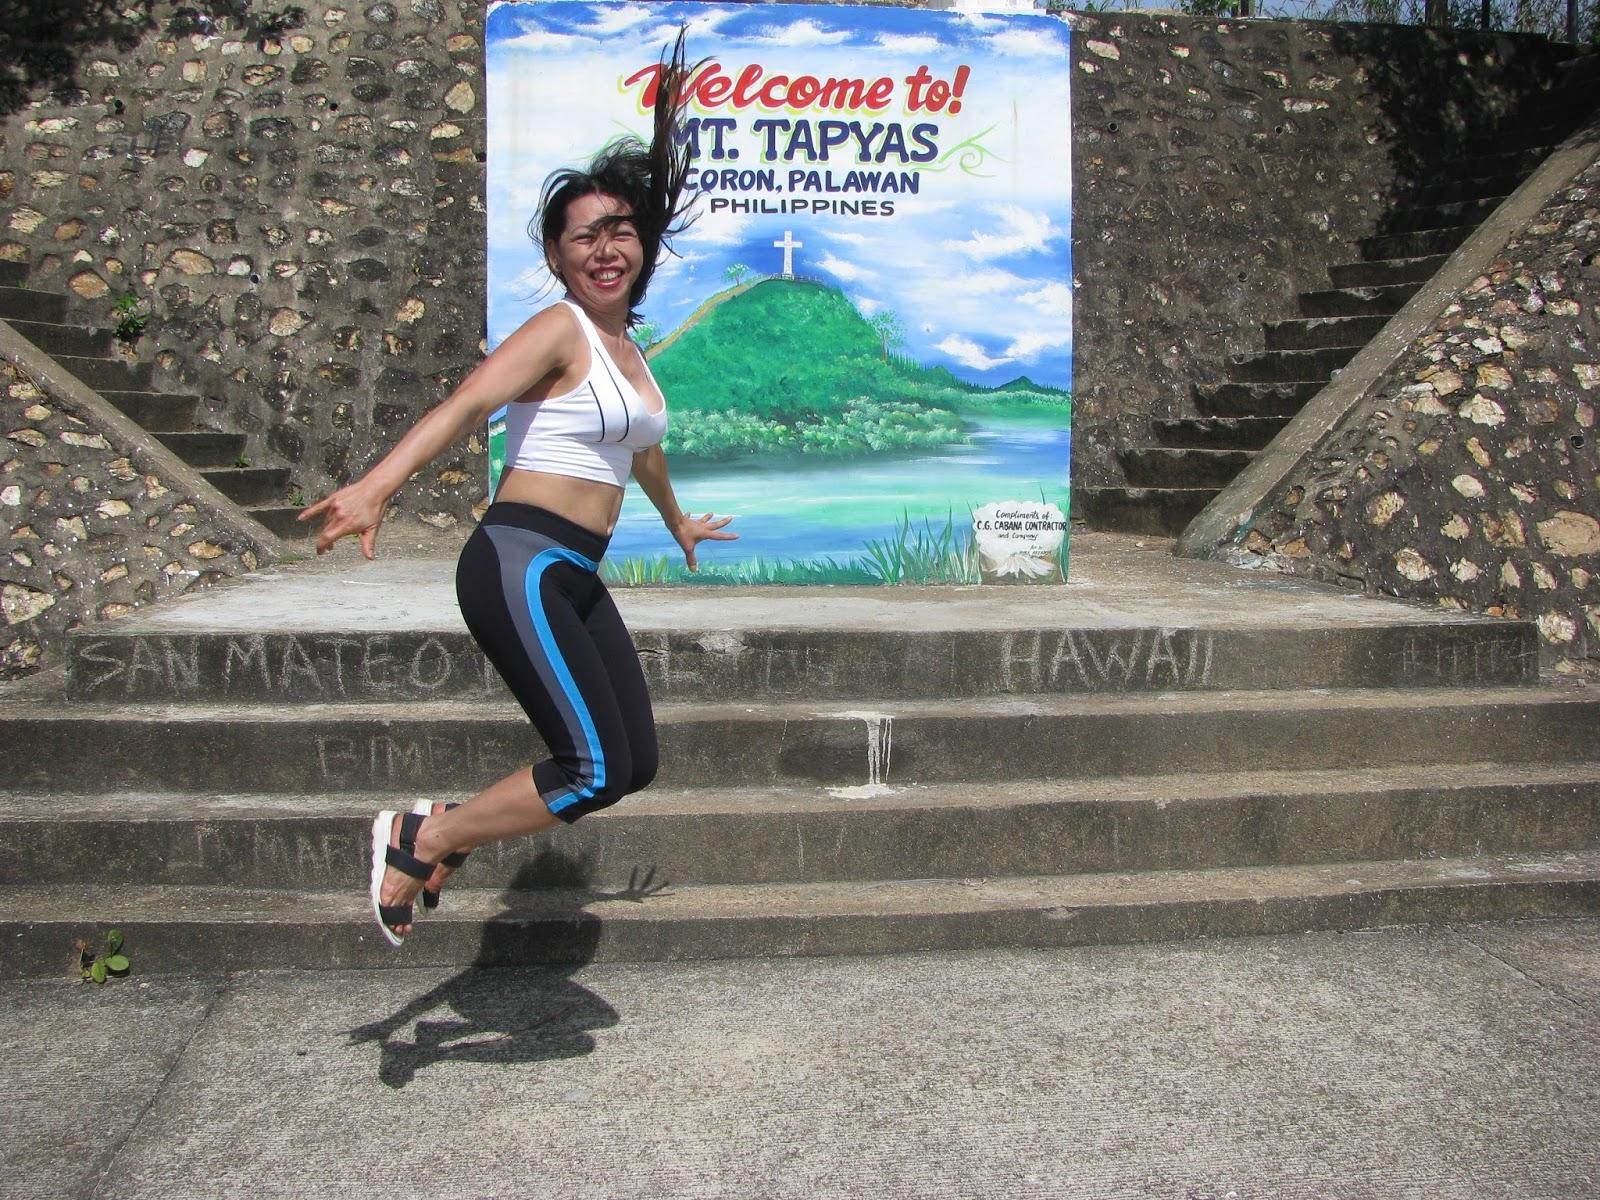 Mt. Tapyas jump